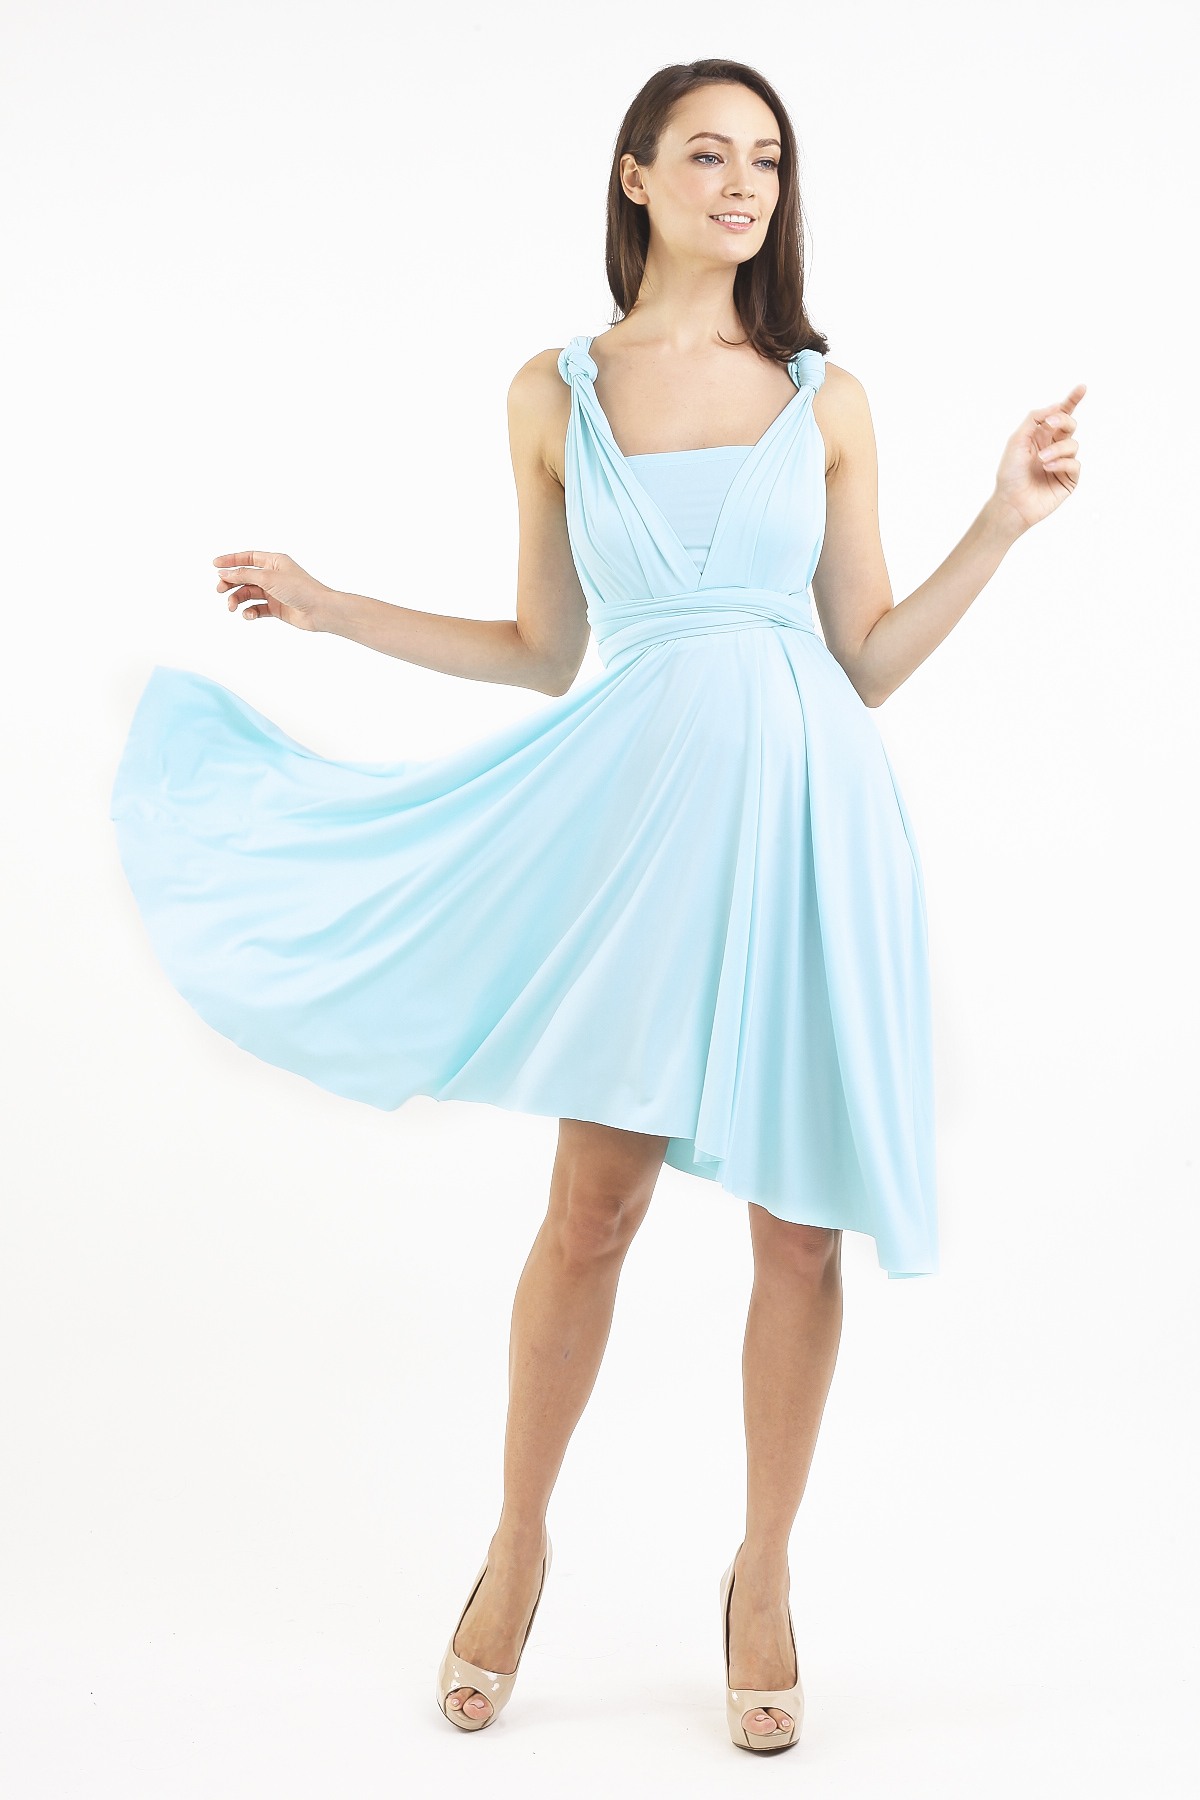 7008f52dd0 INTOXIQUETTE MULTIWAY DRESS IN TIFFANY BLUE